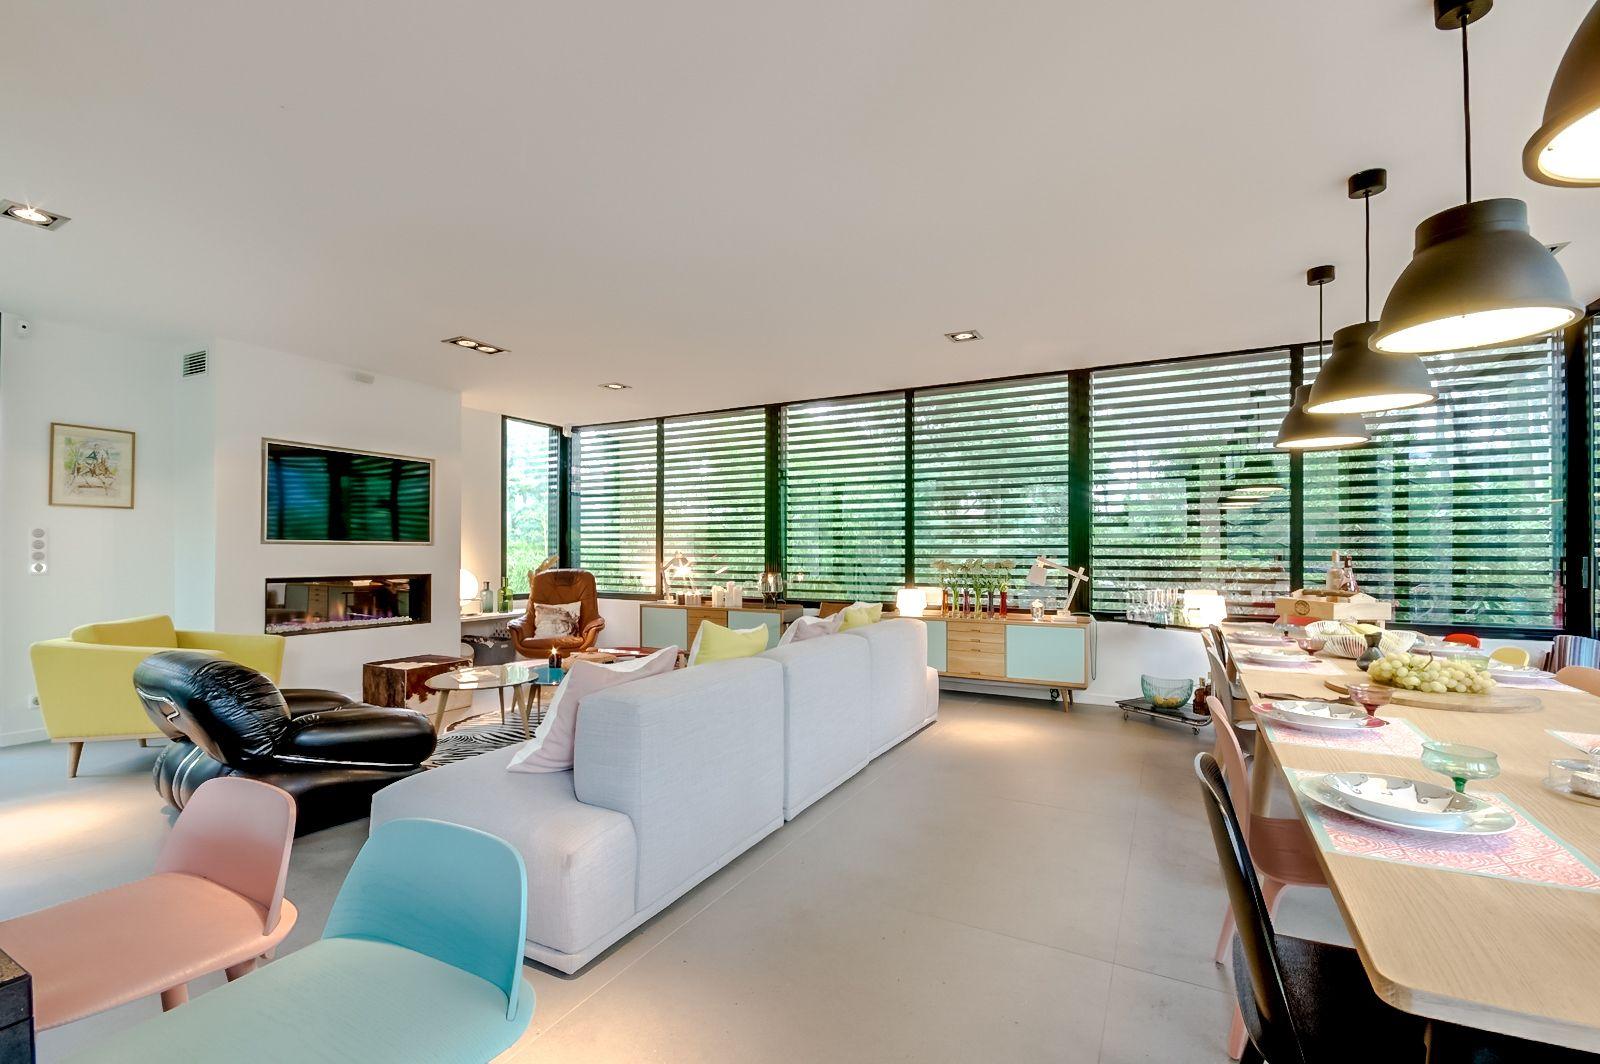 ralisation ccile kokocinski chemine et tv encastre salon familial et table salle manger xxl